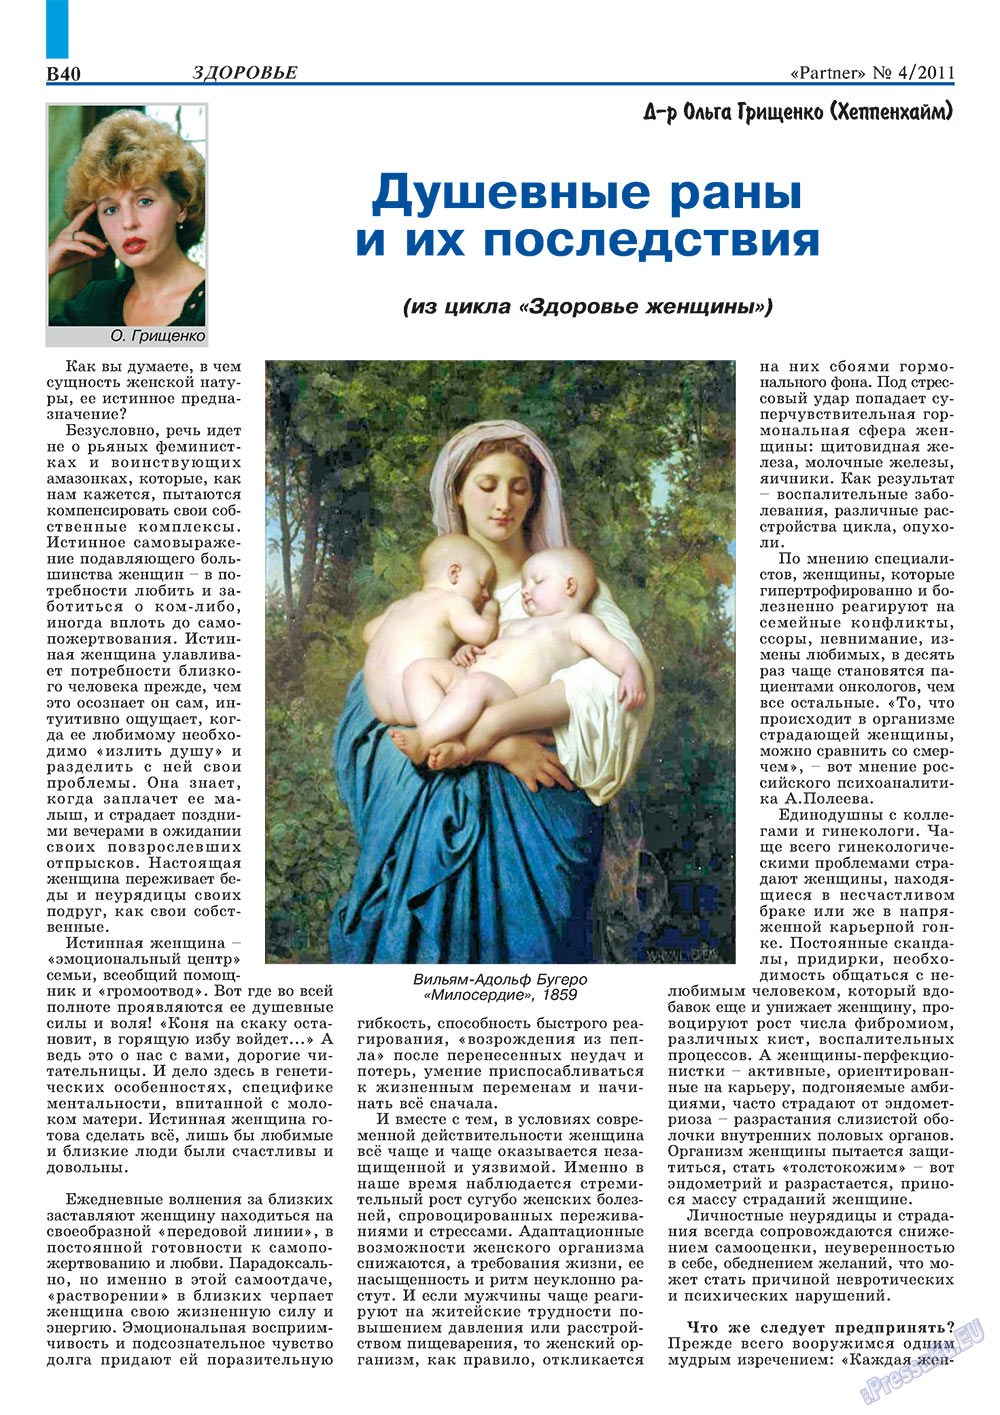 Партнер-север (журнал). 2011 год, номер 4, стр. 50